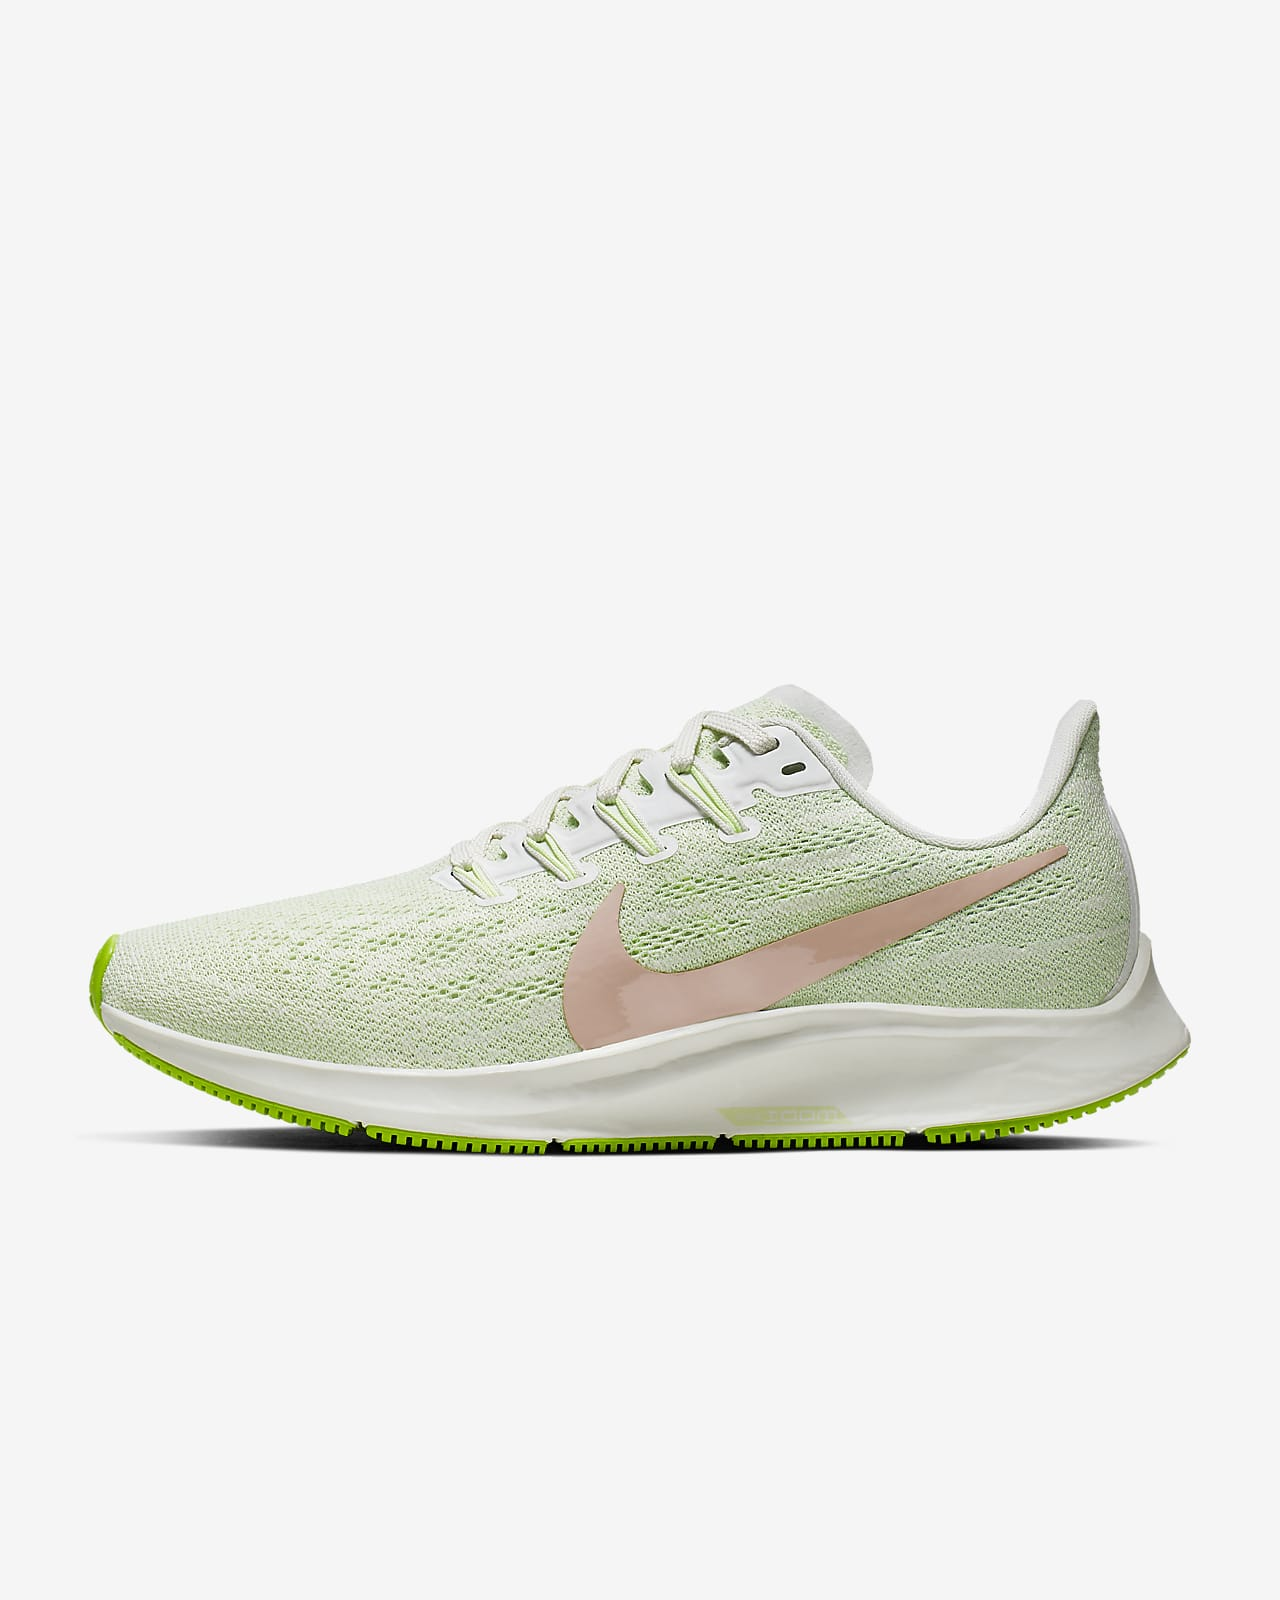 Chaussure de running Nike Air Zoom Pegasus 36 pour Femme. Nike LU